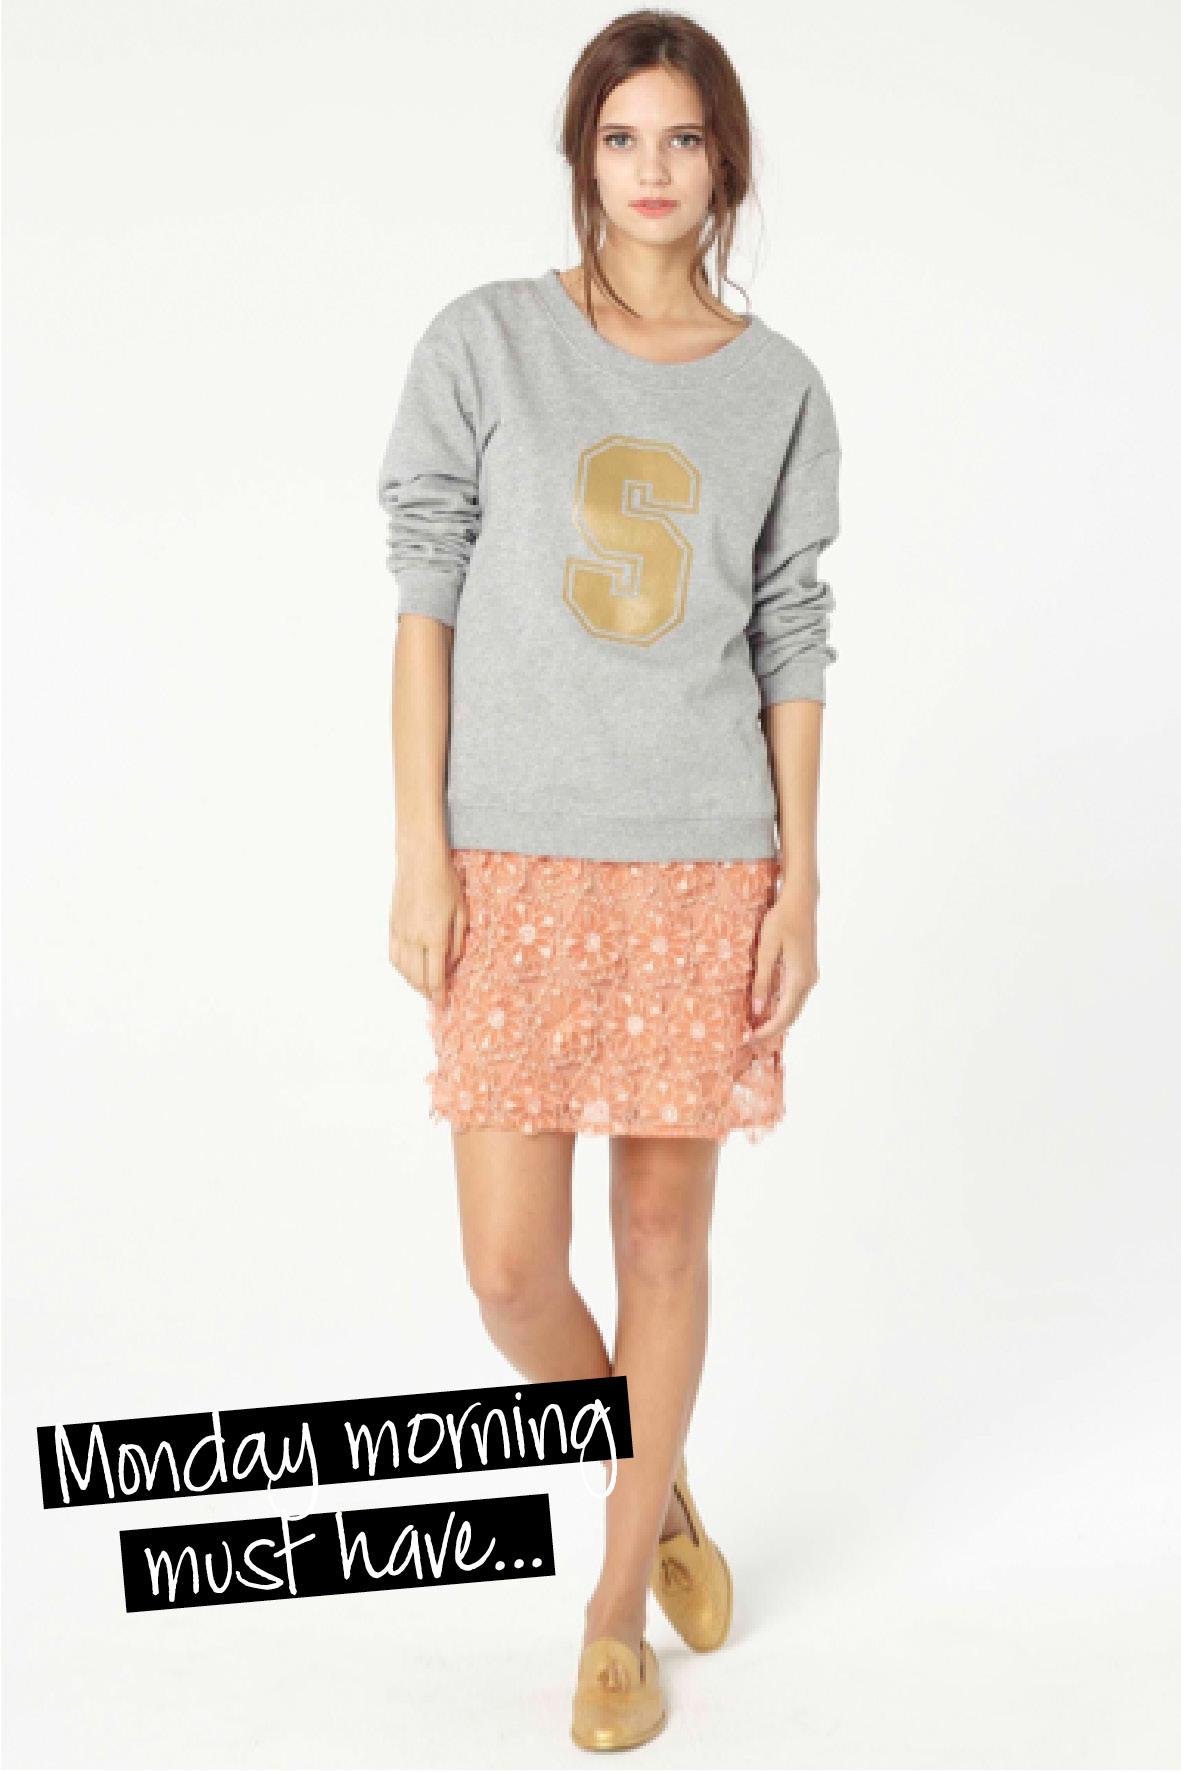 MondayMorning3